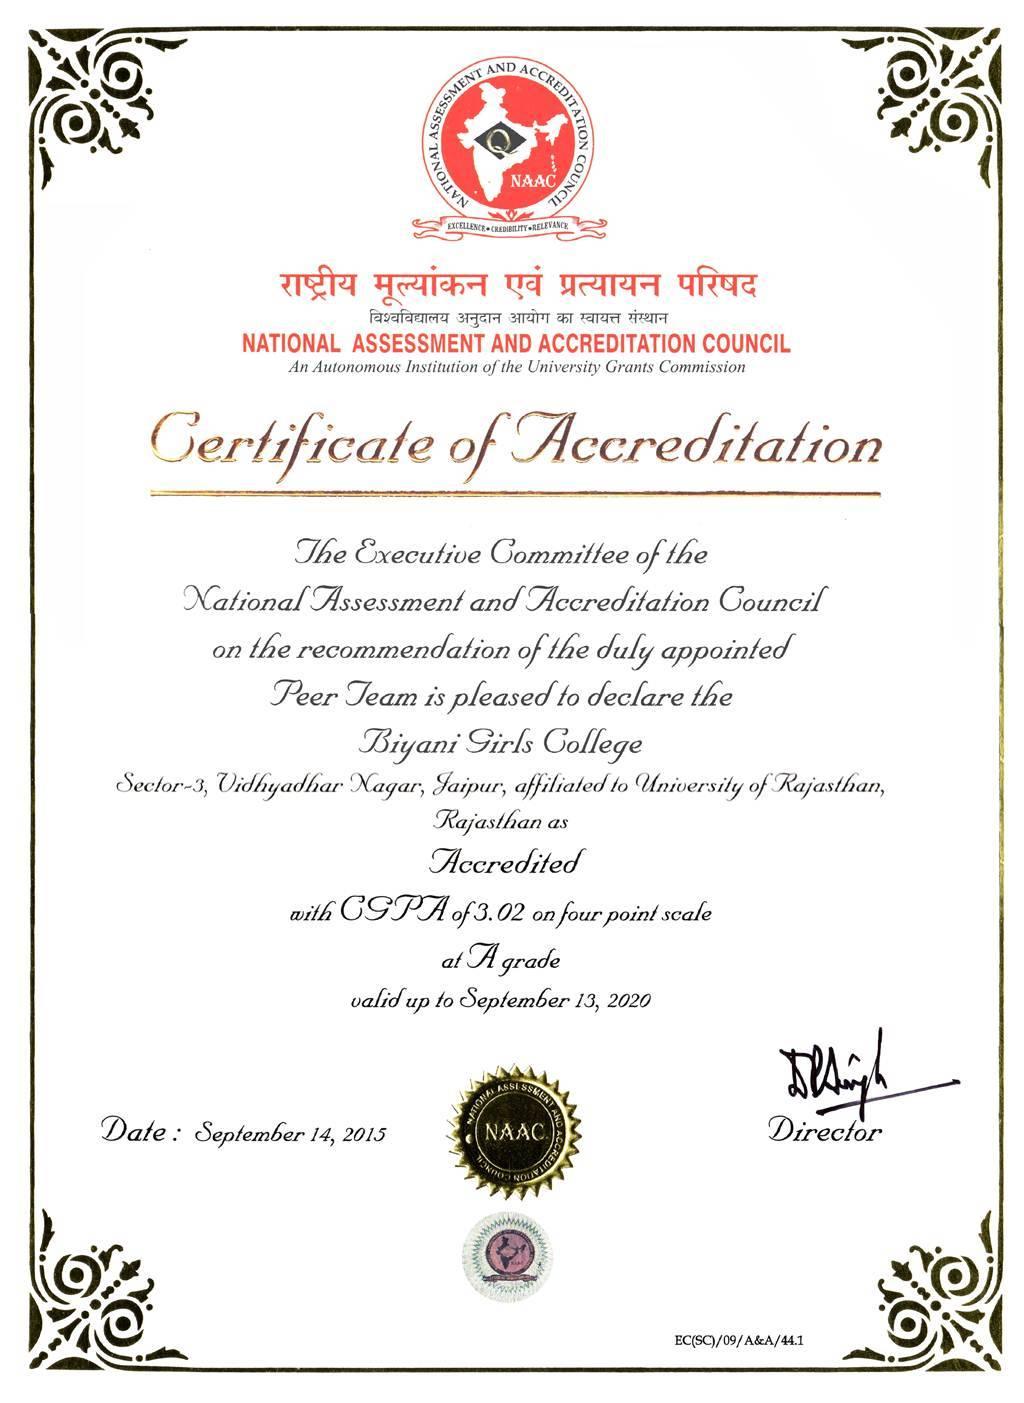 NAAC Certificate